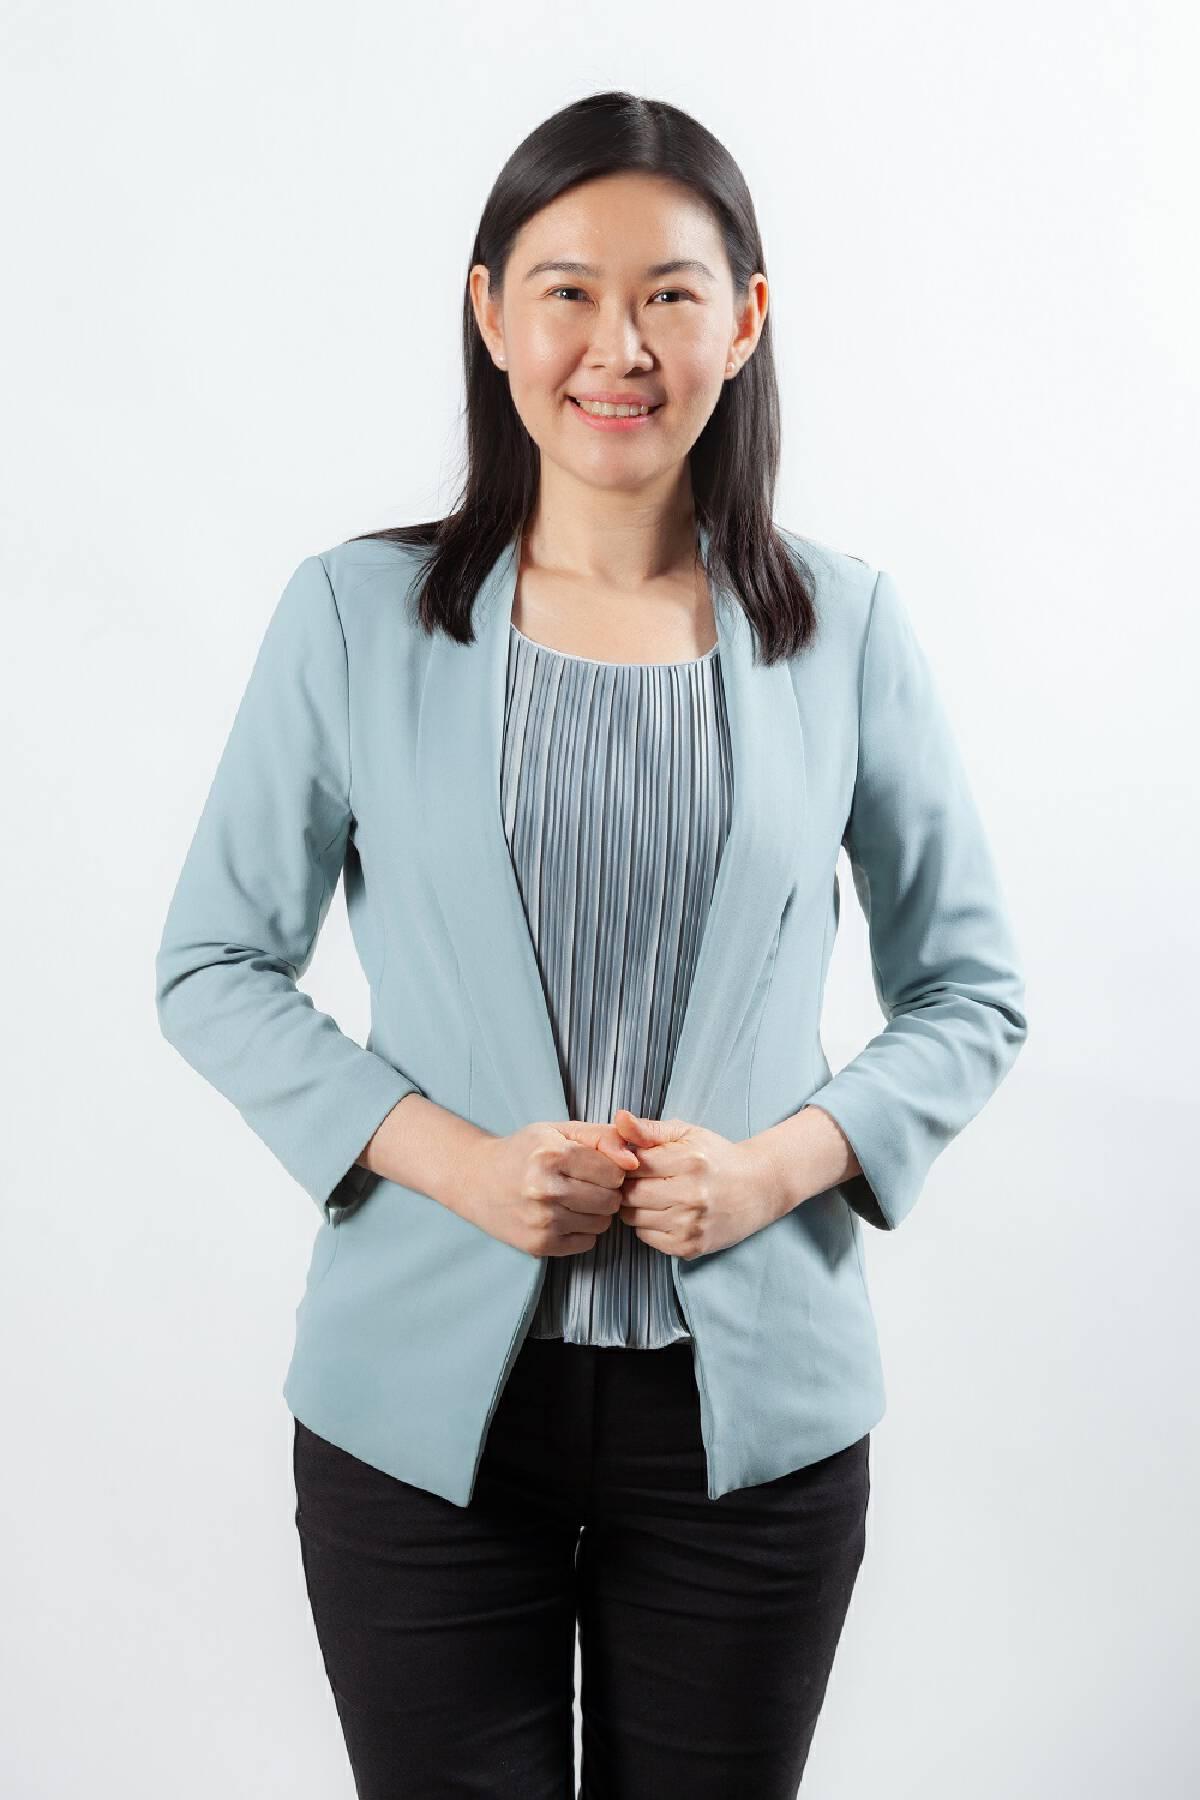 Tidarat Chimluang, Advisory Partner, KPMG in Thailand.